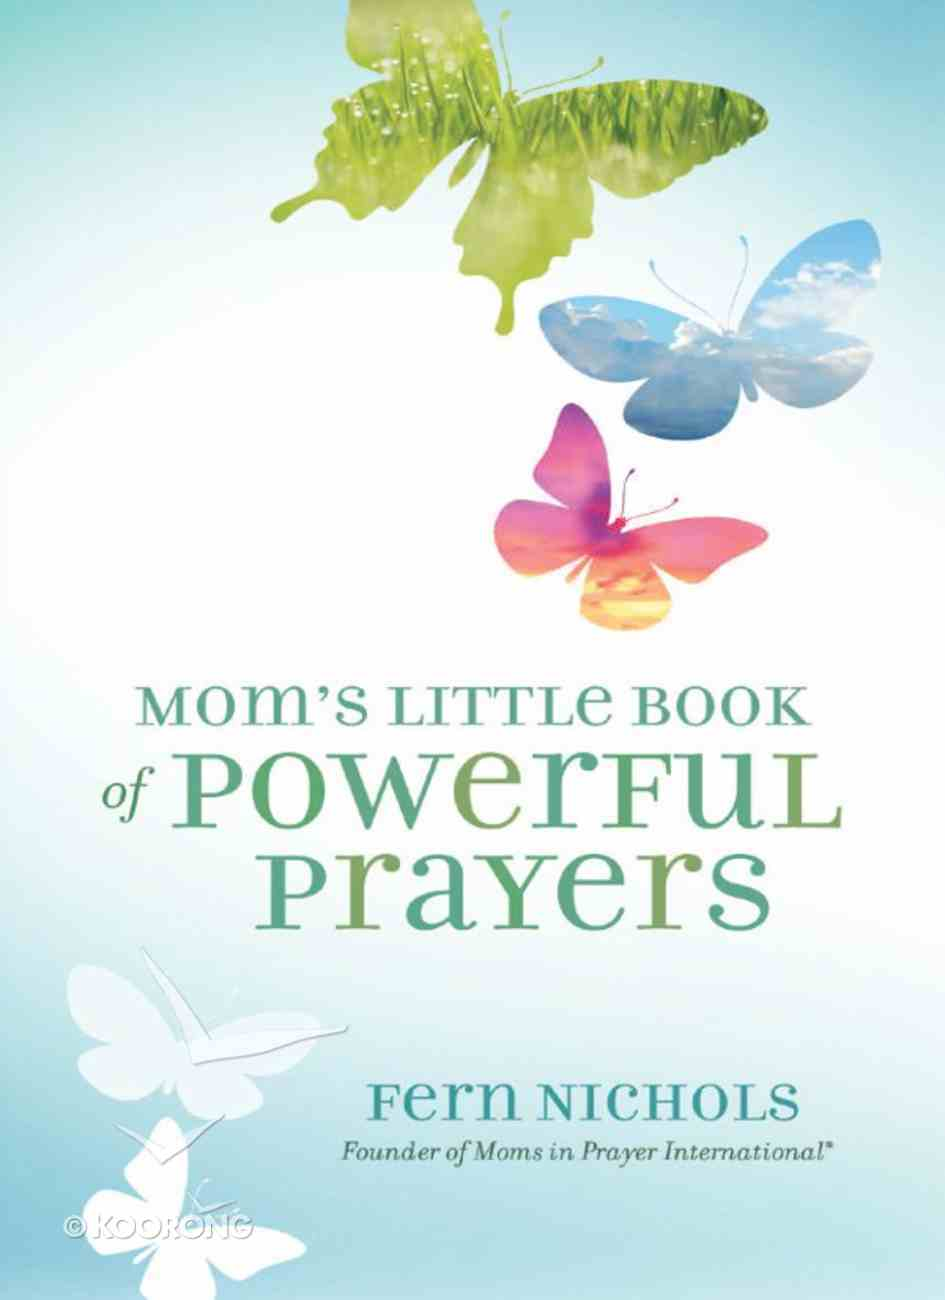 Mom's Little Book of Powerful Prayers eBook